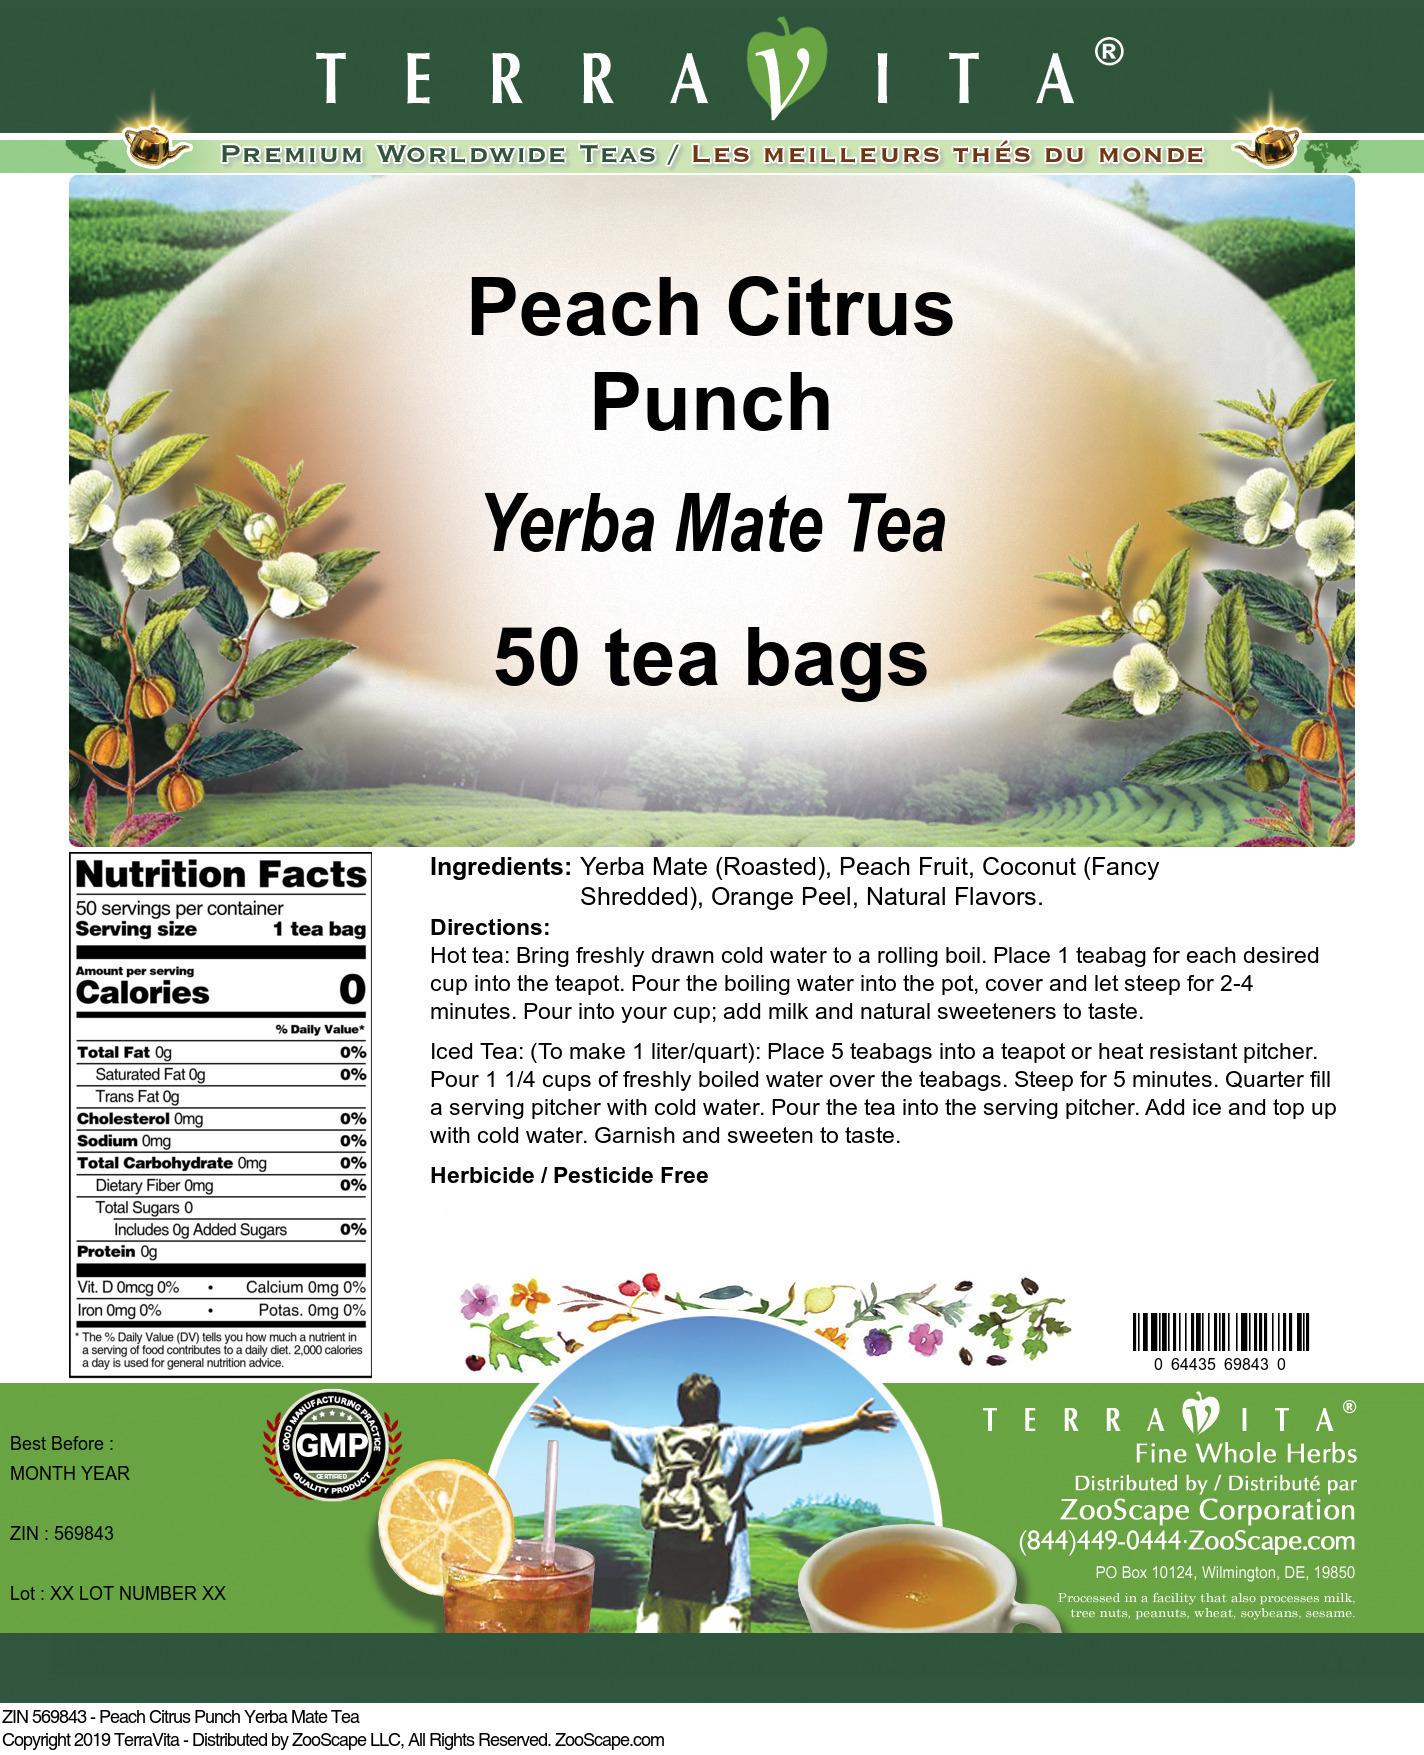 Peach Citrus Punch Yerba Mate